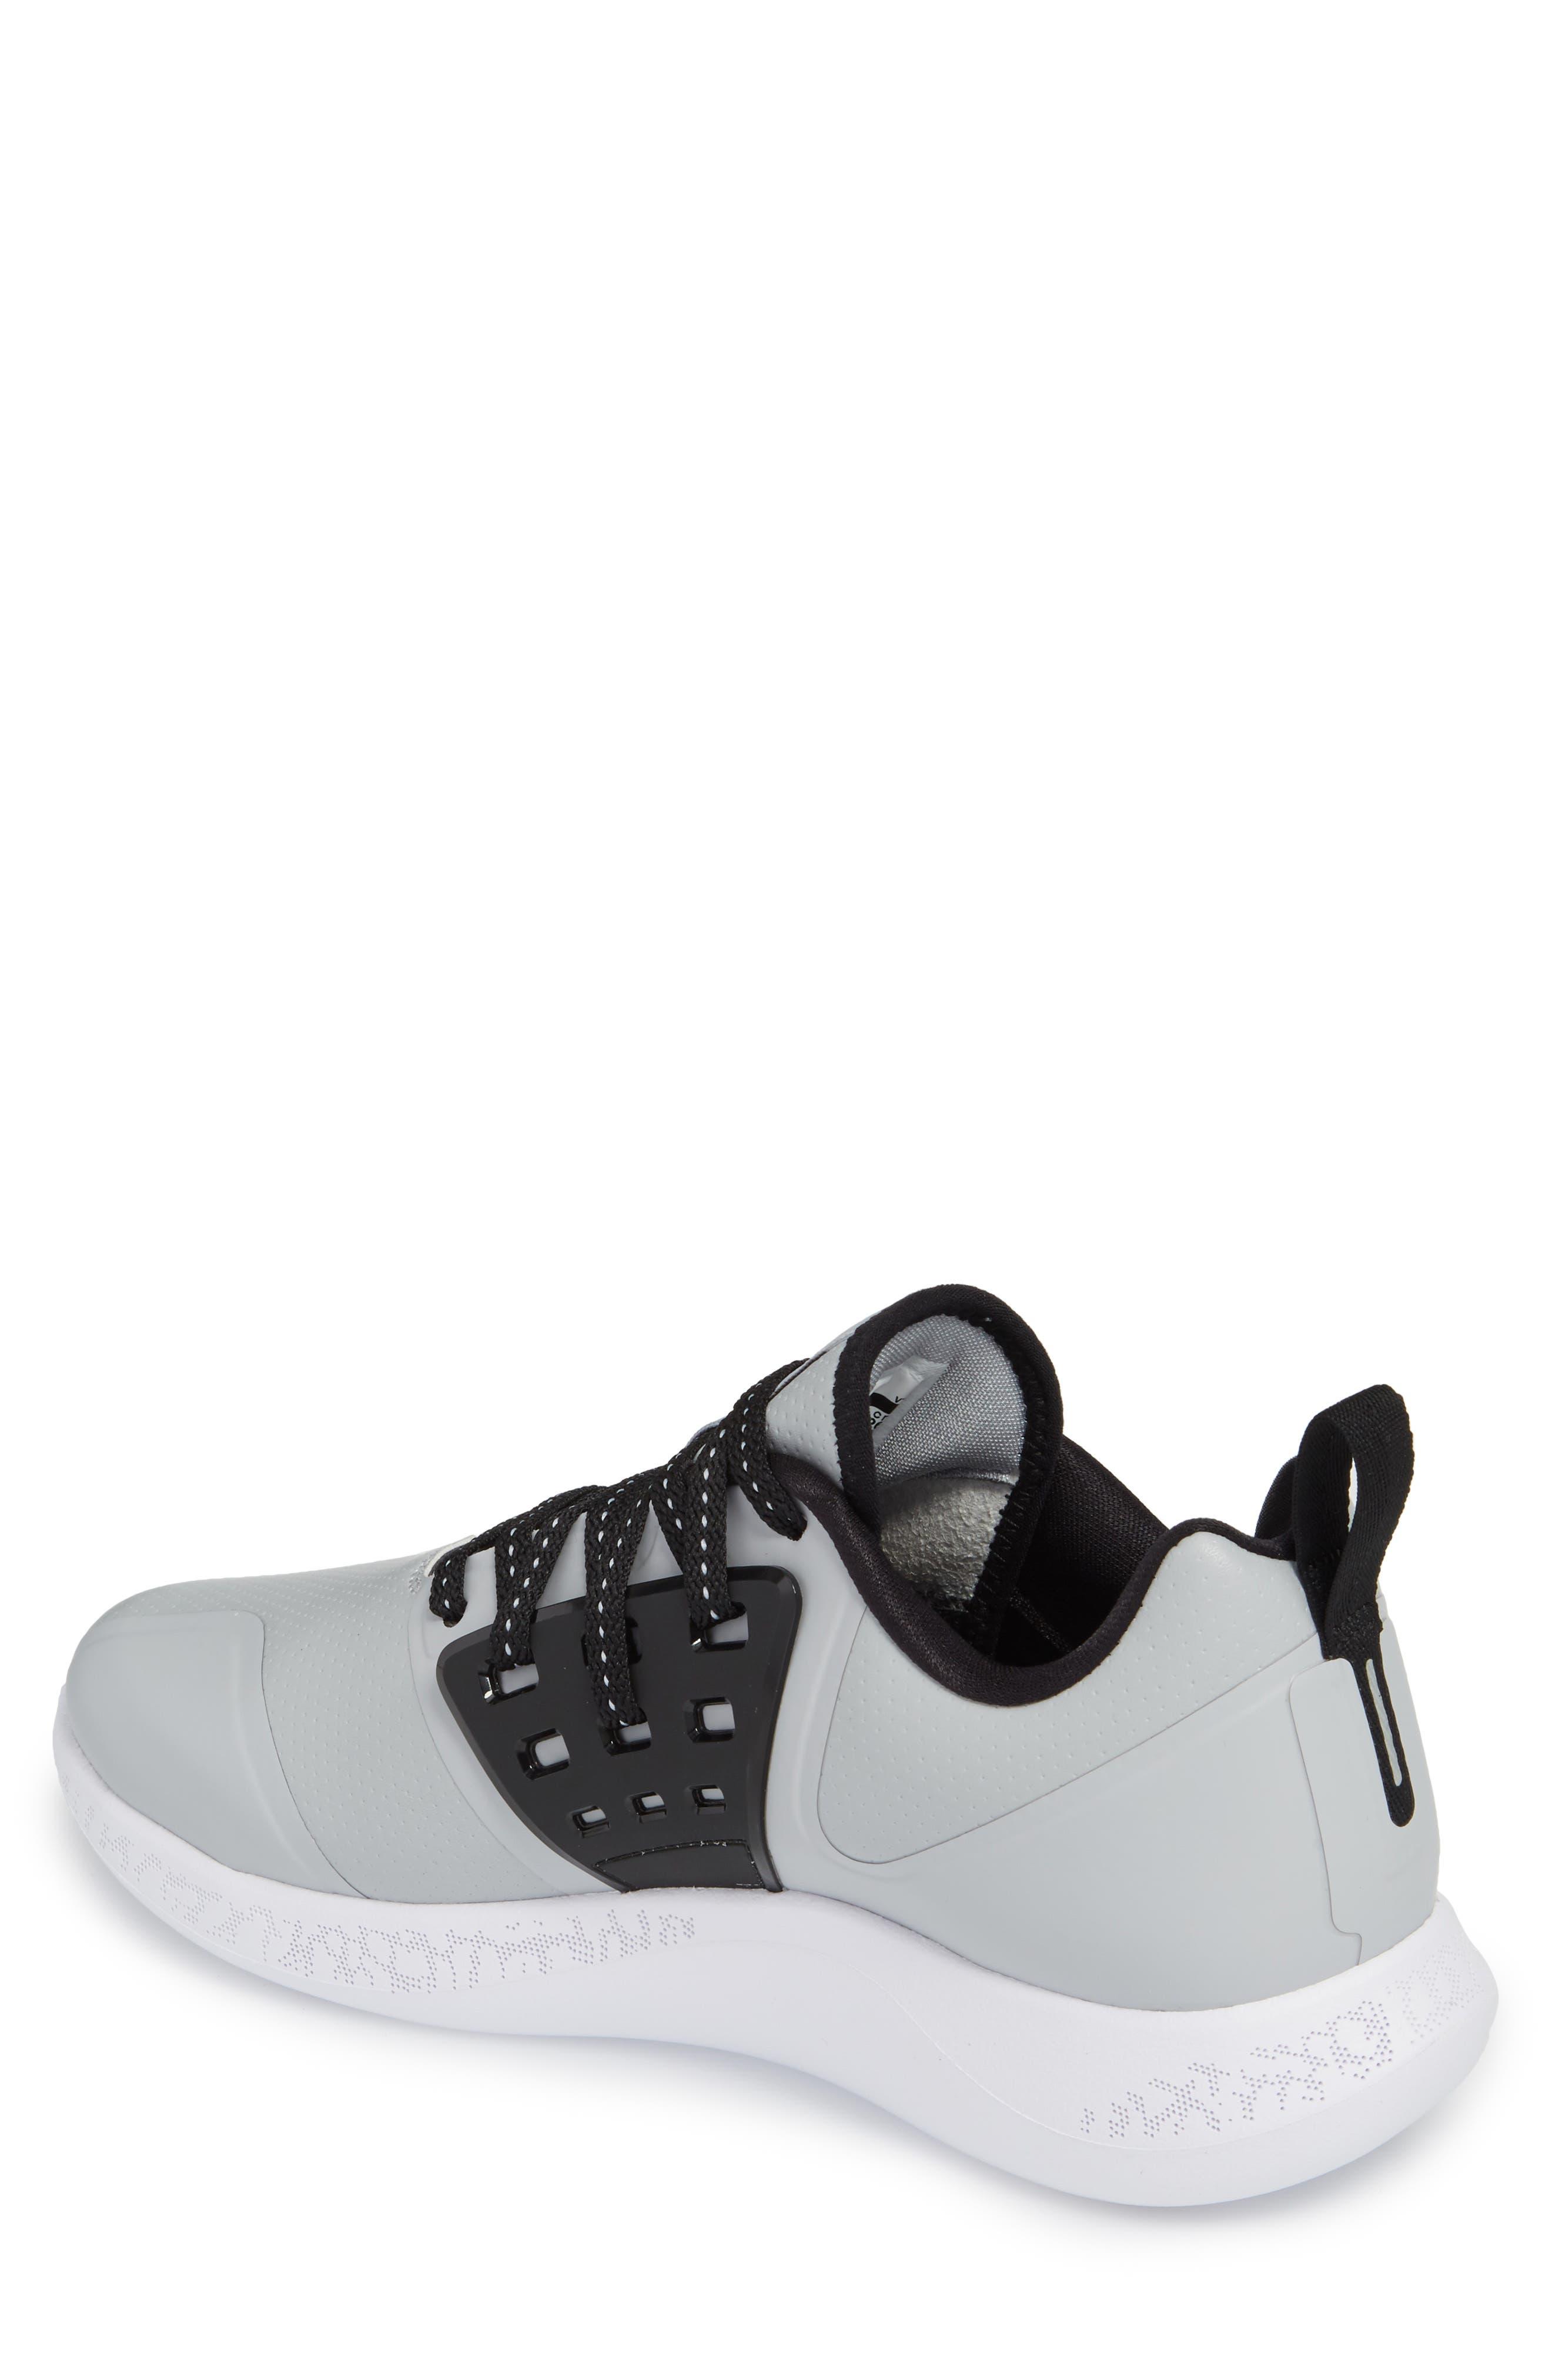 Jordan Grind Running Shoe,                             Alternate thumbnail 2, color,                             Wolf Grey/ Black/ White